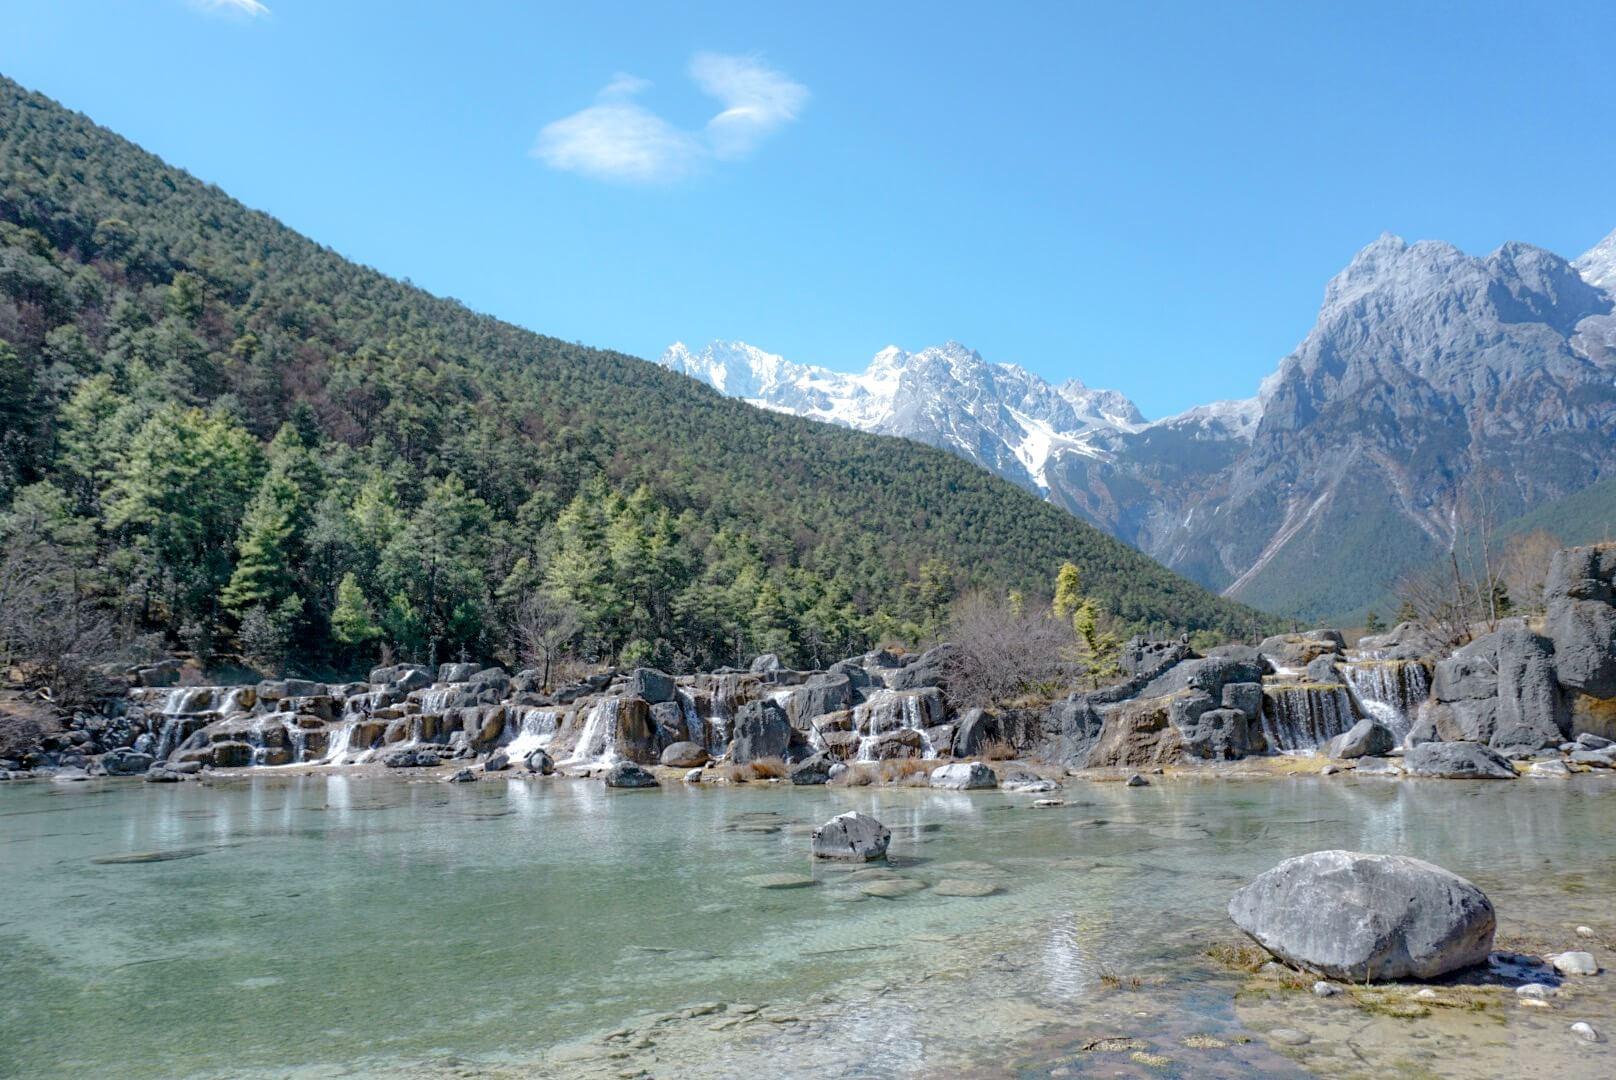 Montagne Yunnan lac bleu dragon de jade